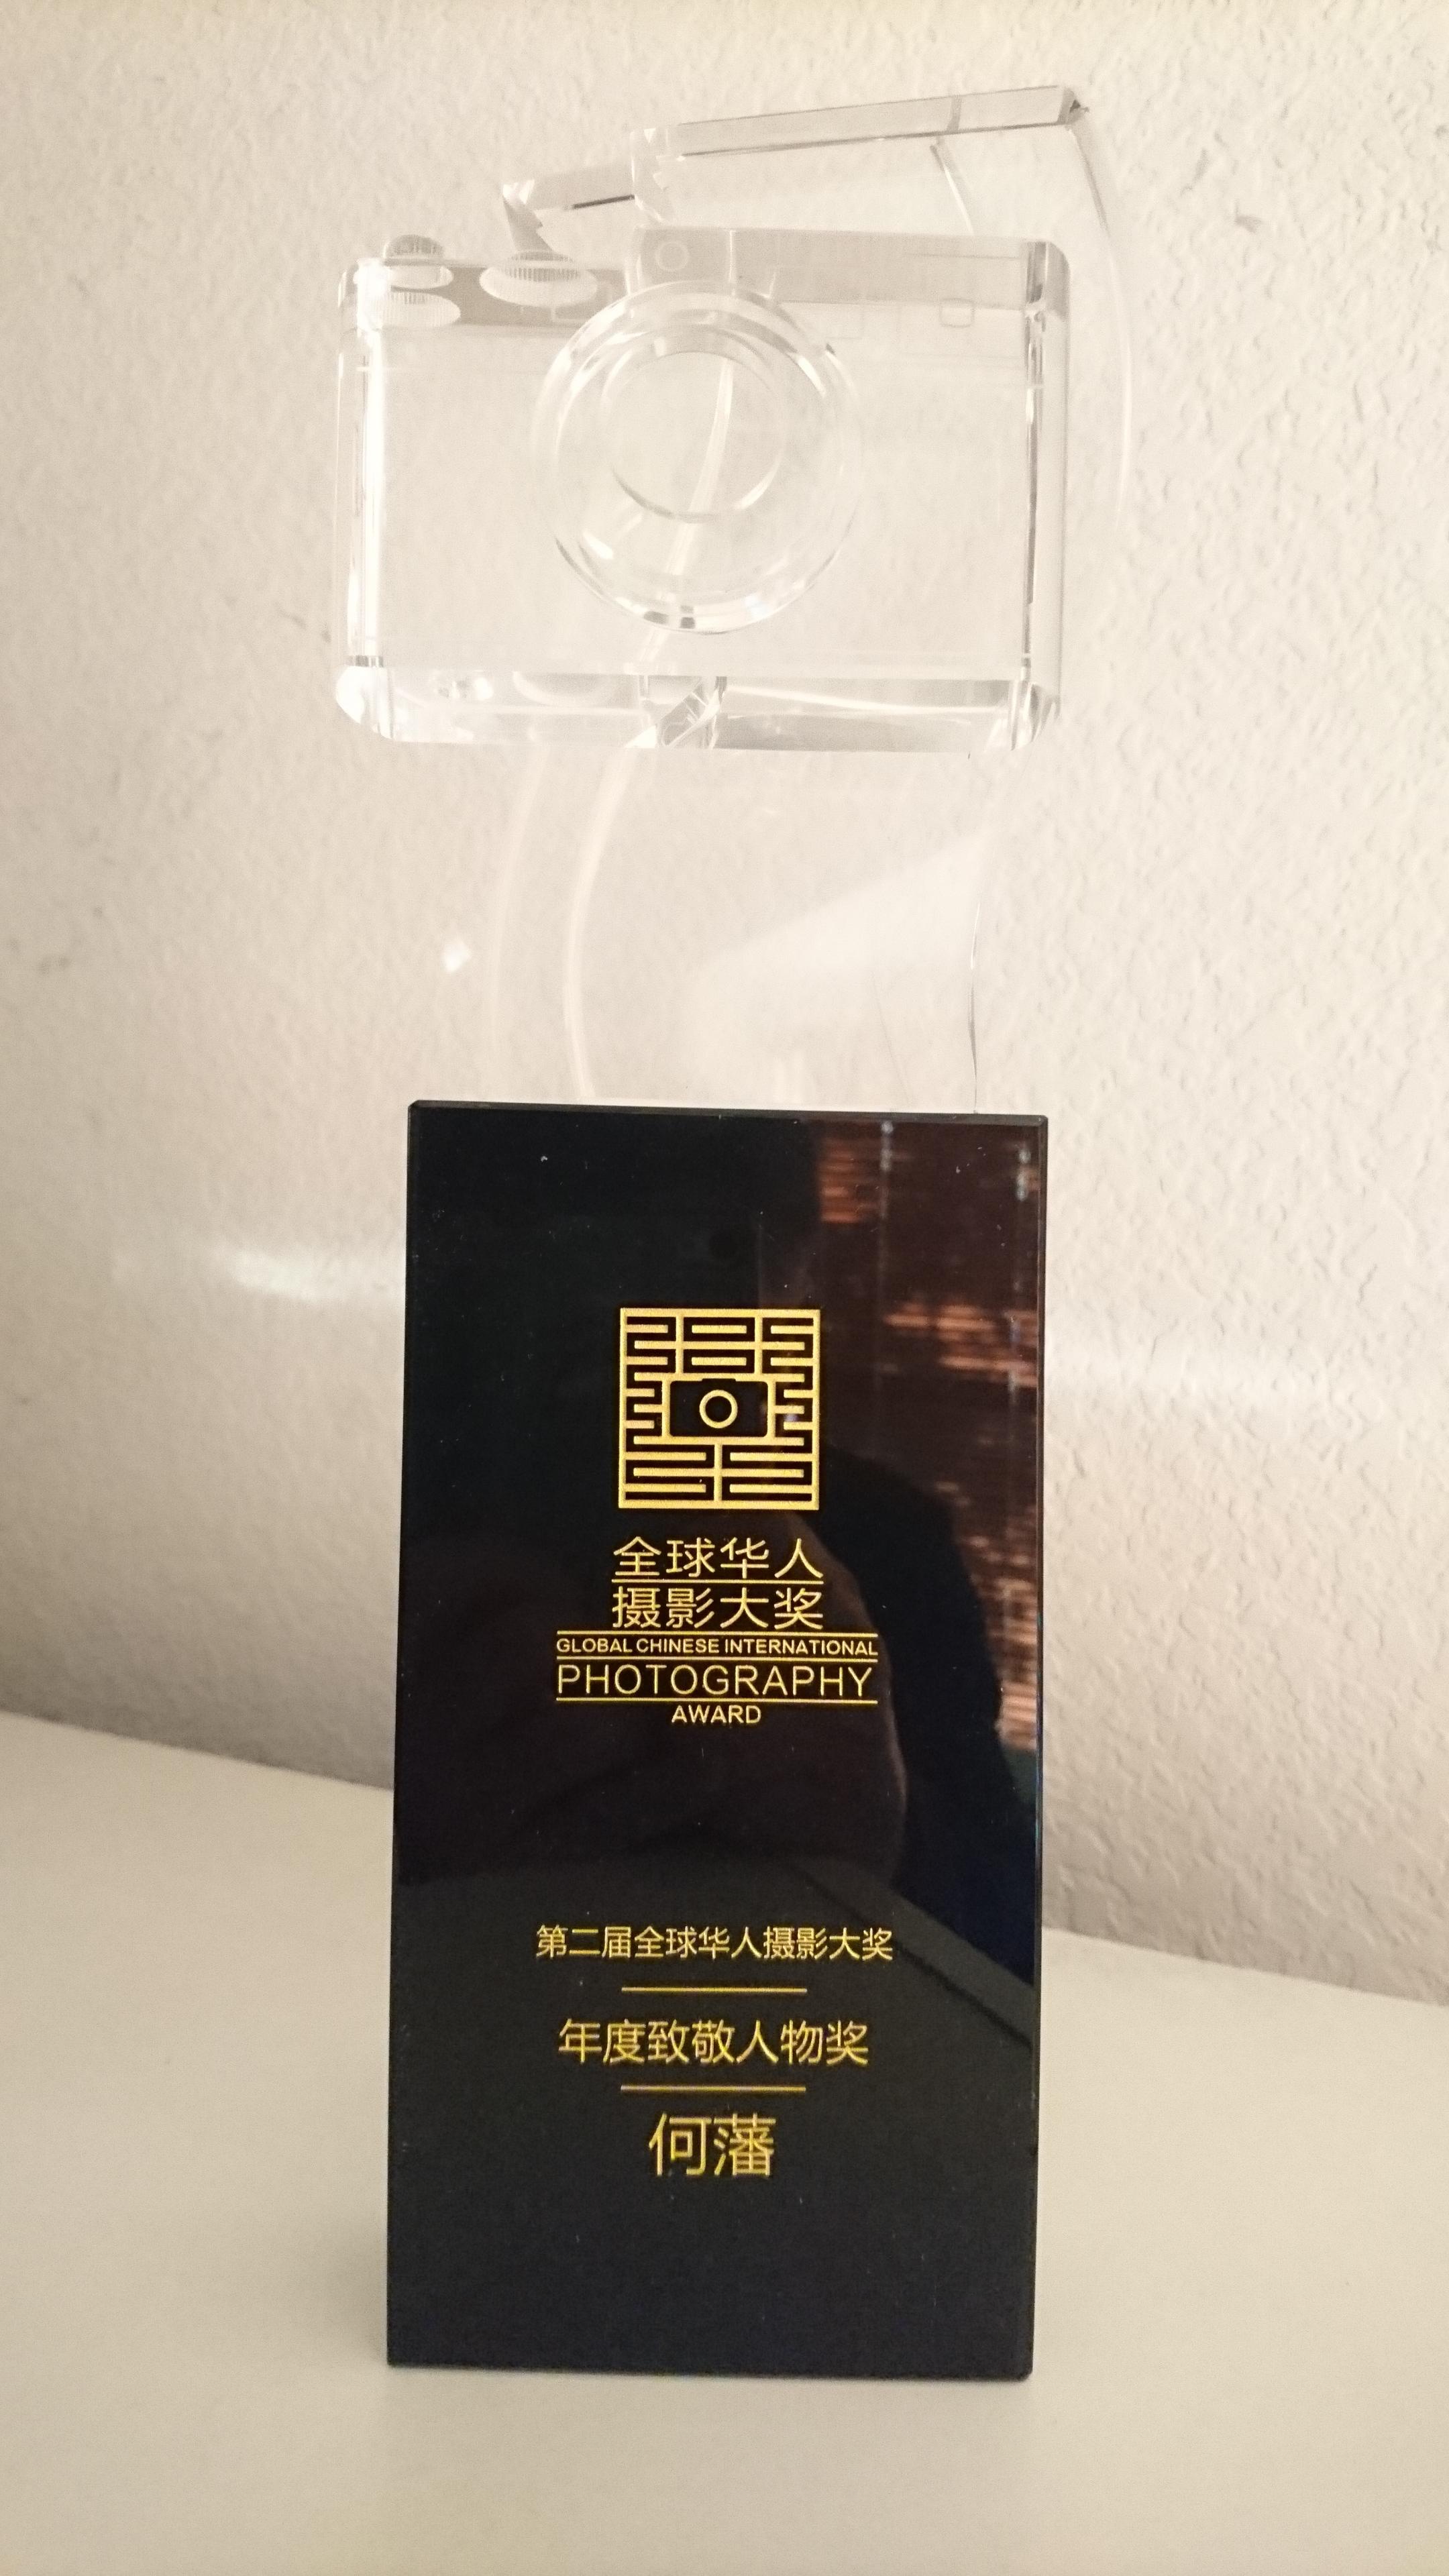 A Birthday Remembrance of Master Fan Ho... - 第二屆全球華人攝影大獎「年度致敬人物獎」